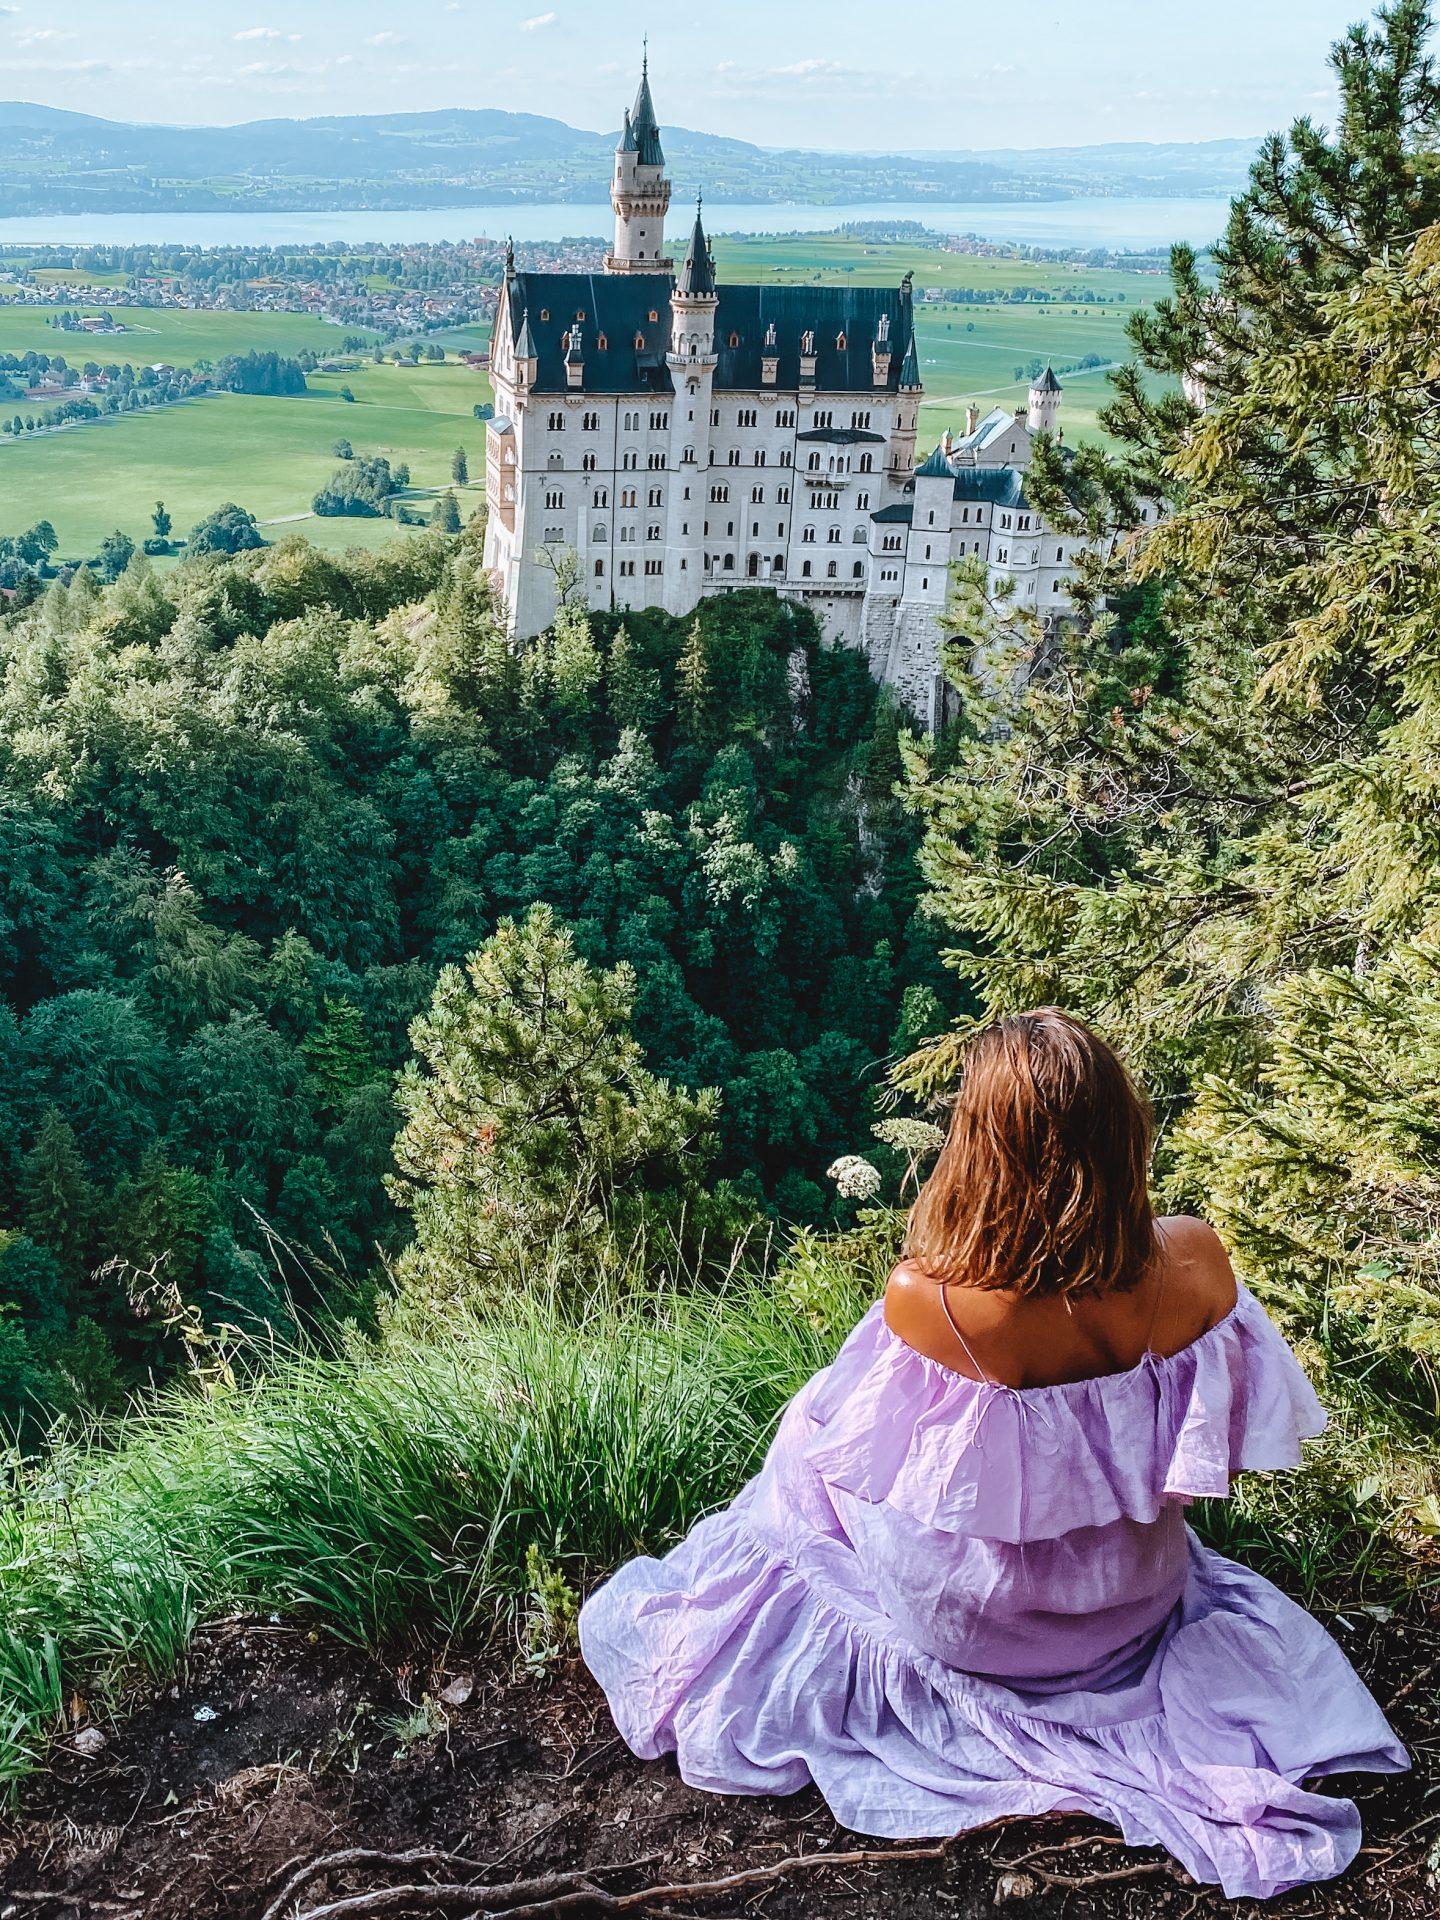 Neuschwanstein castle fairytale from the top